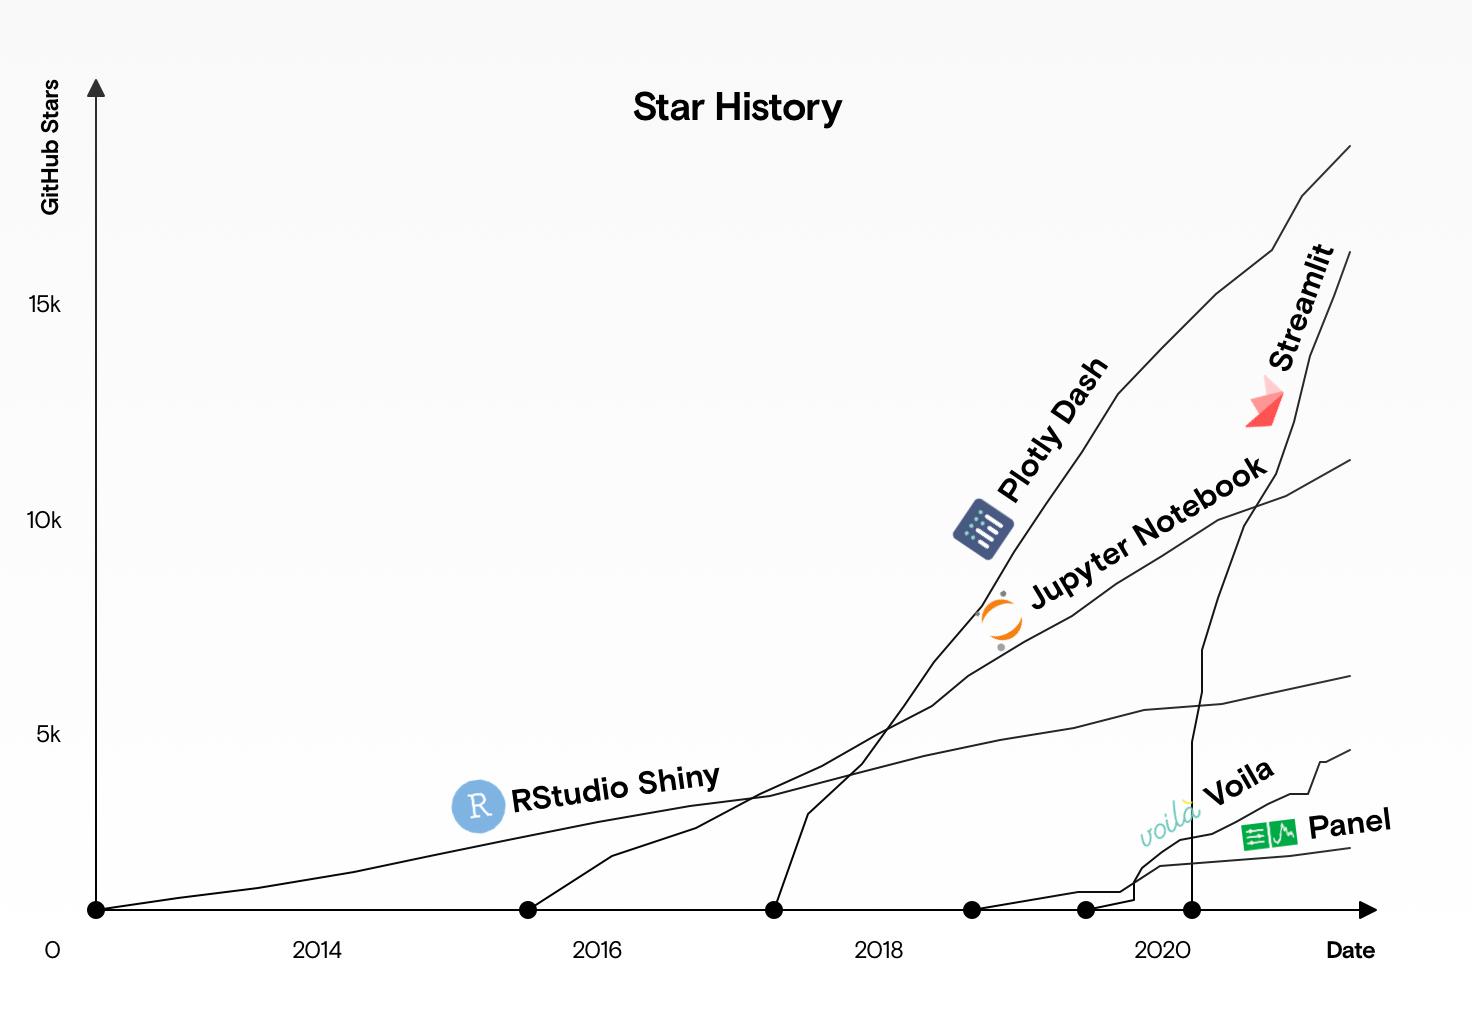 A graph showing the GitHub star history of Viola, Dash, Shiny, Streamlit, Jupyter, and Panel.